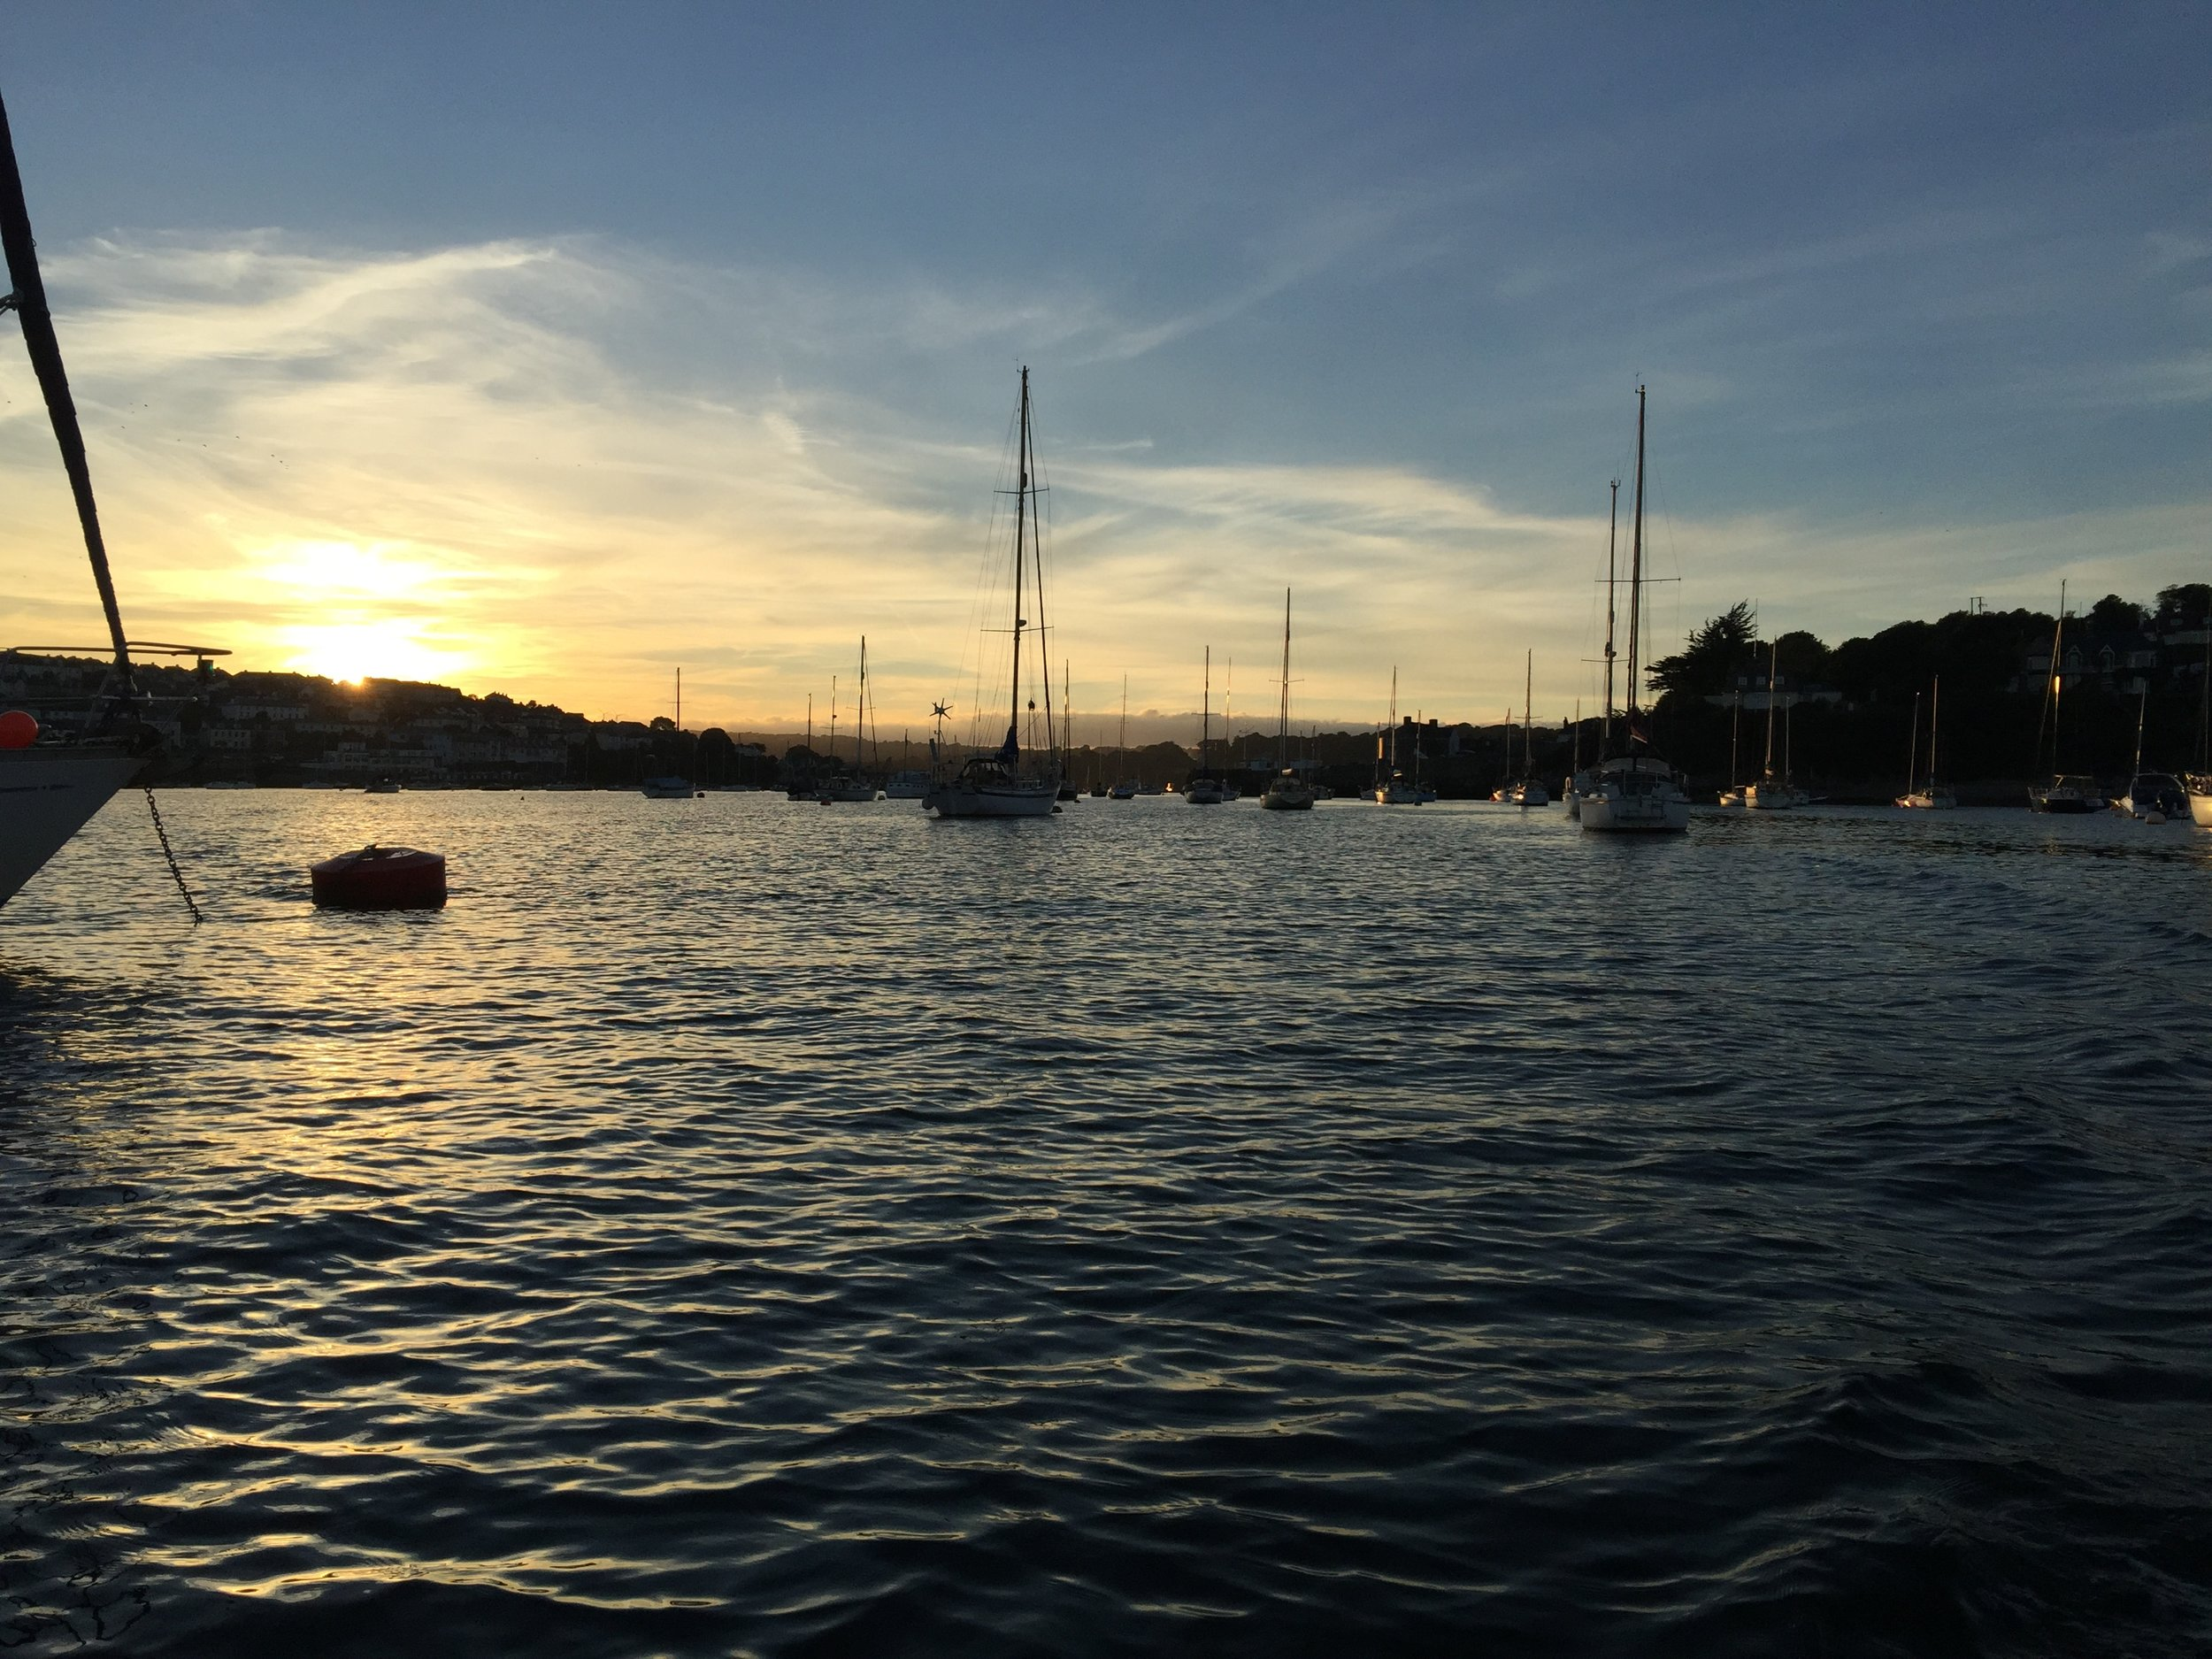 Sun setting in Falmouth as Miss Meakin heads toward Flushing.